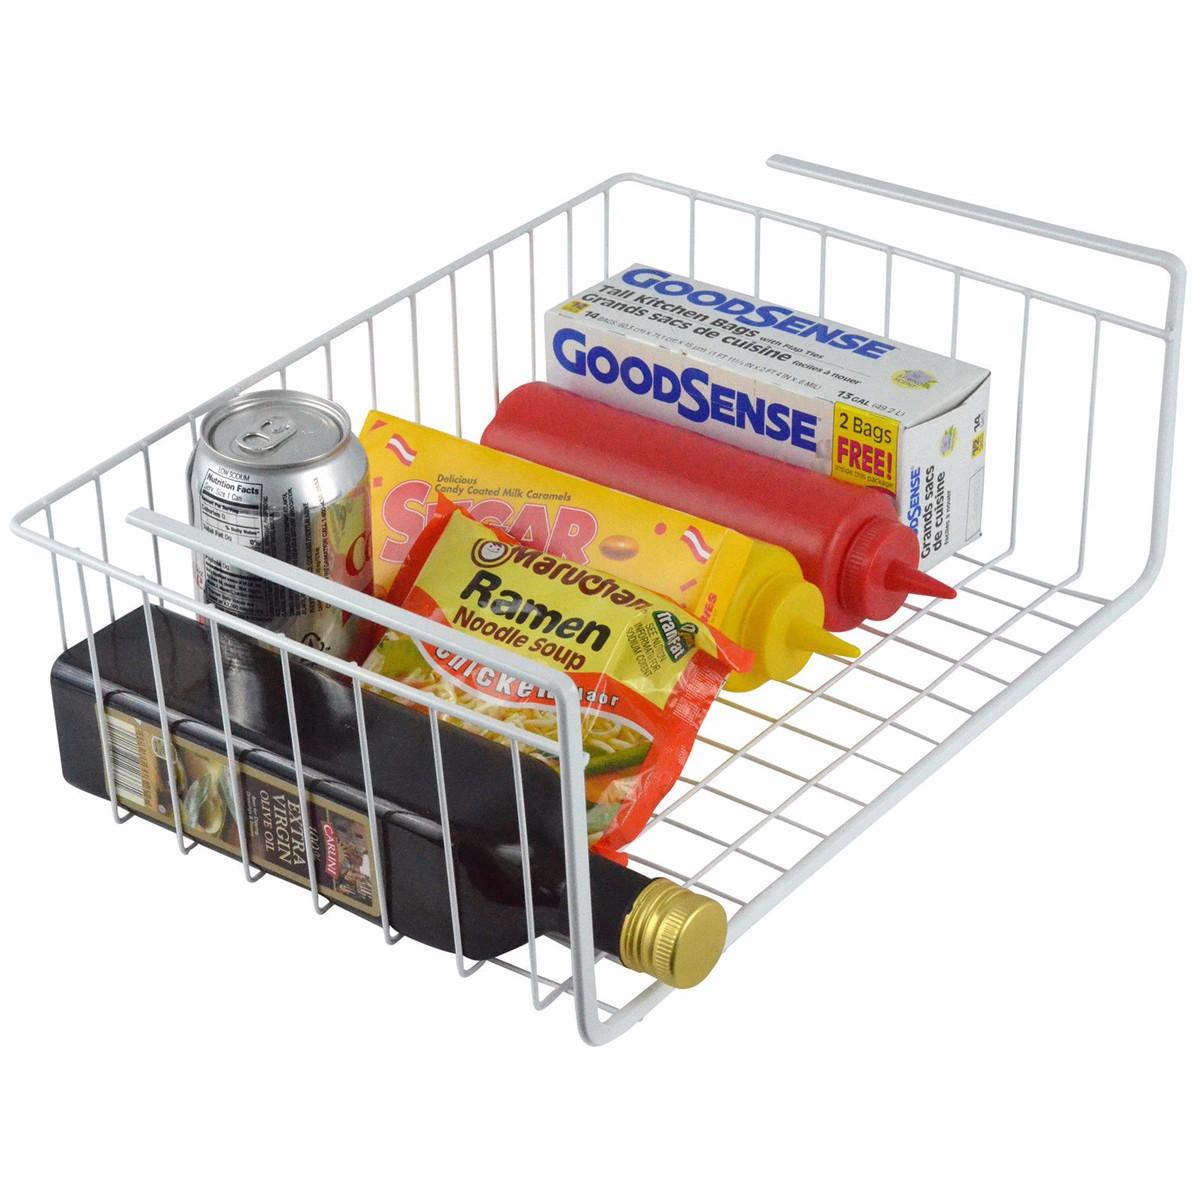 Under shelf basket wire wrap rack white storage organizer for Under shelf basket wrap rack